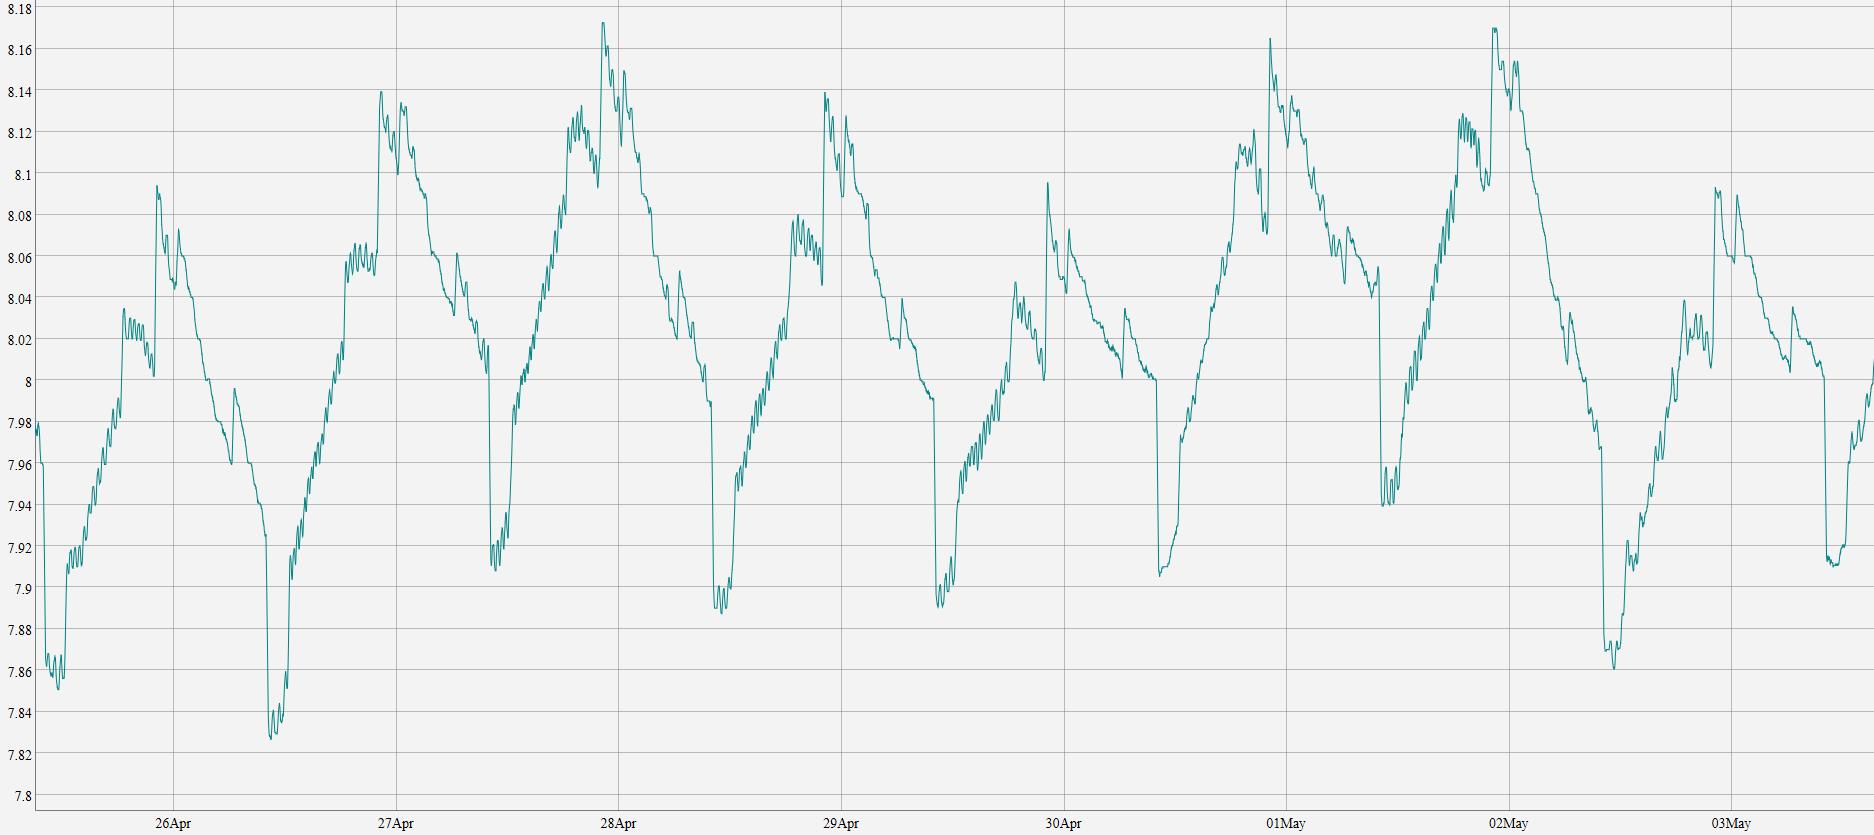 PH graph.PNG